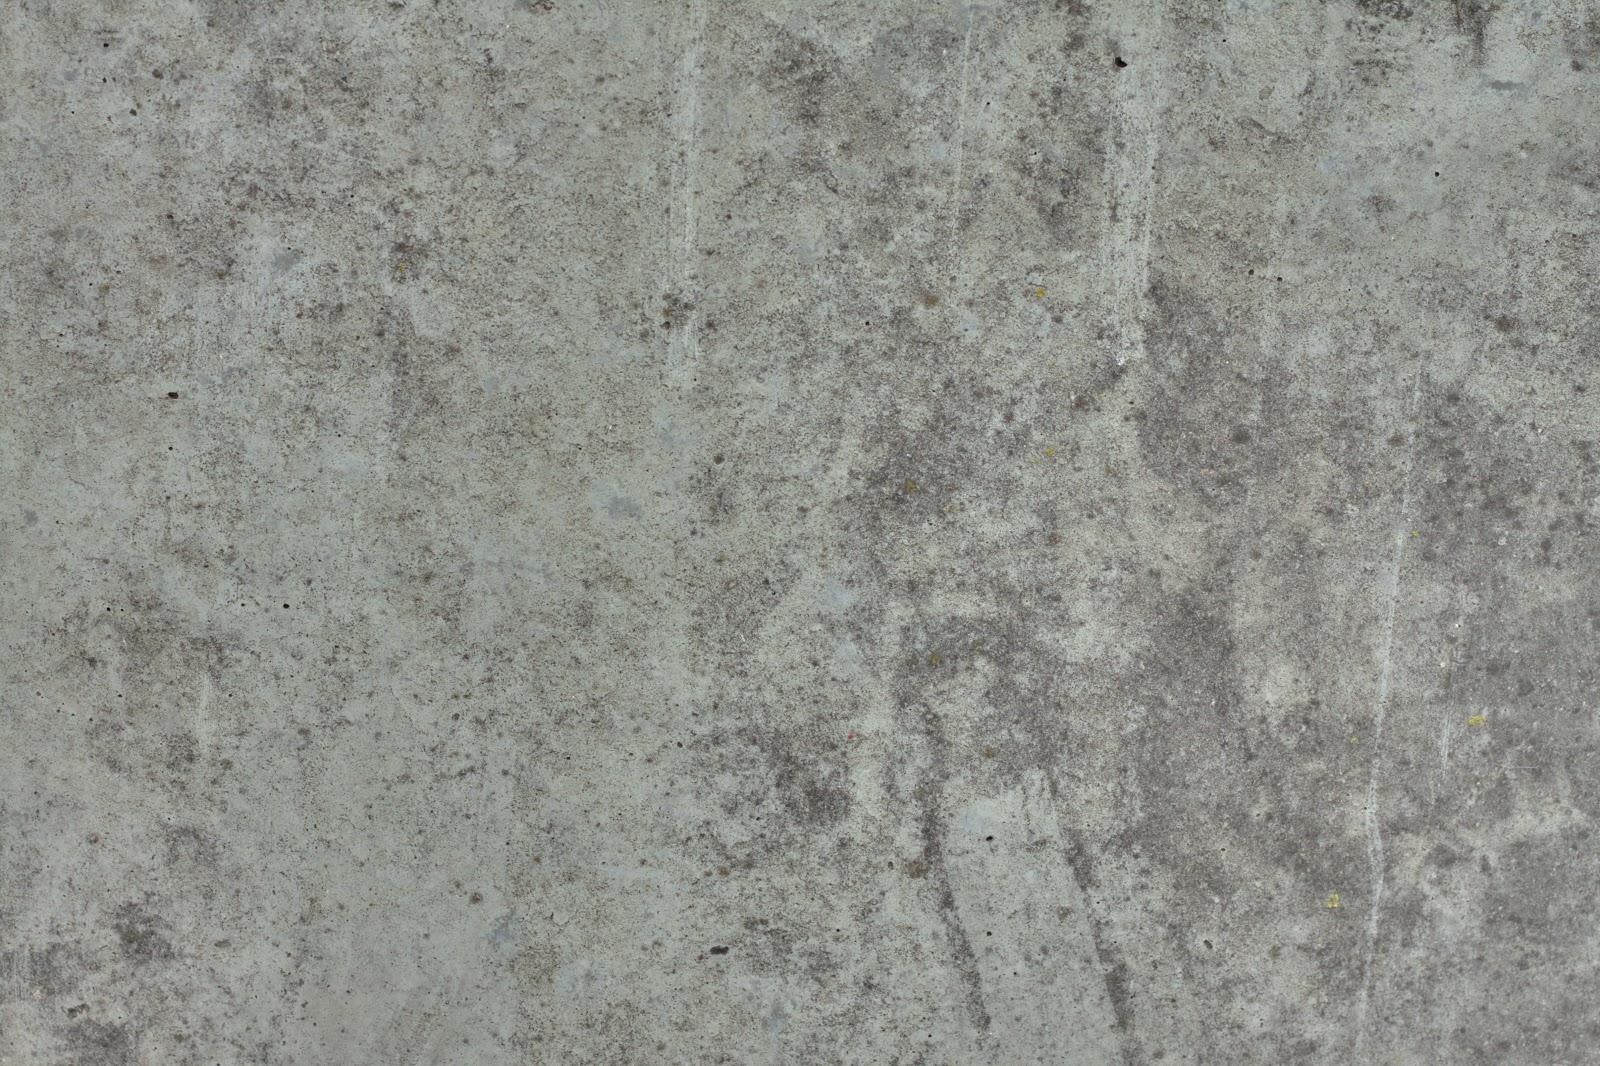 Smooth Stone Wall Dark Www Pixshark Com Images